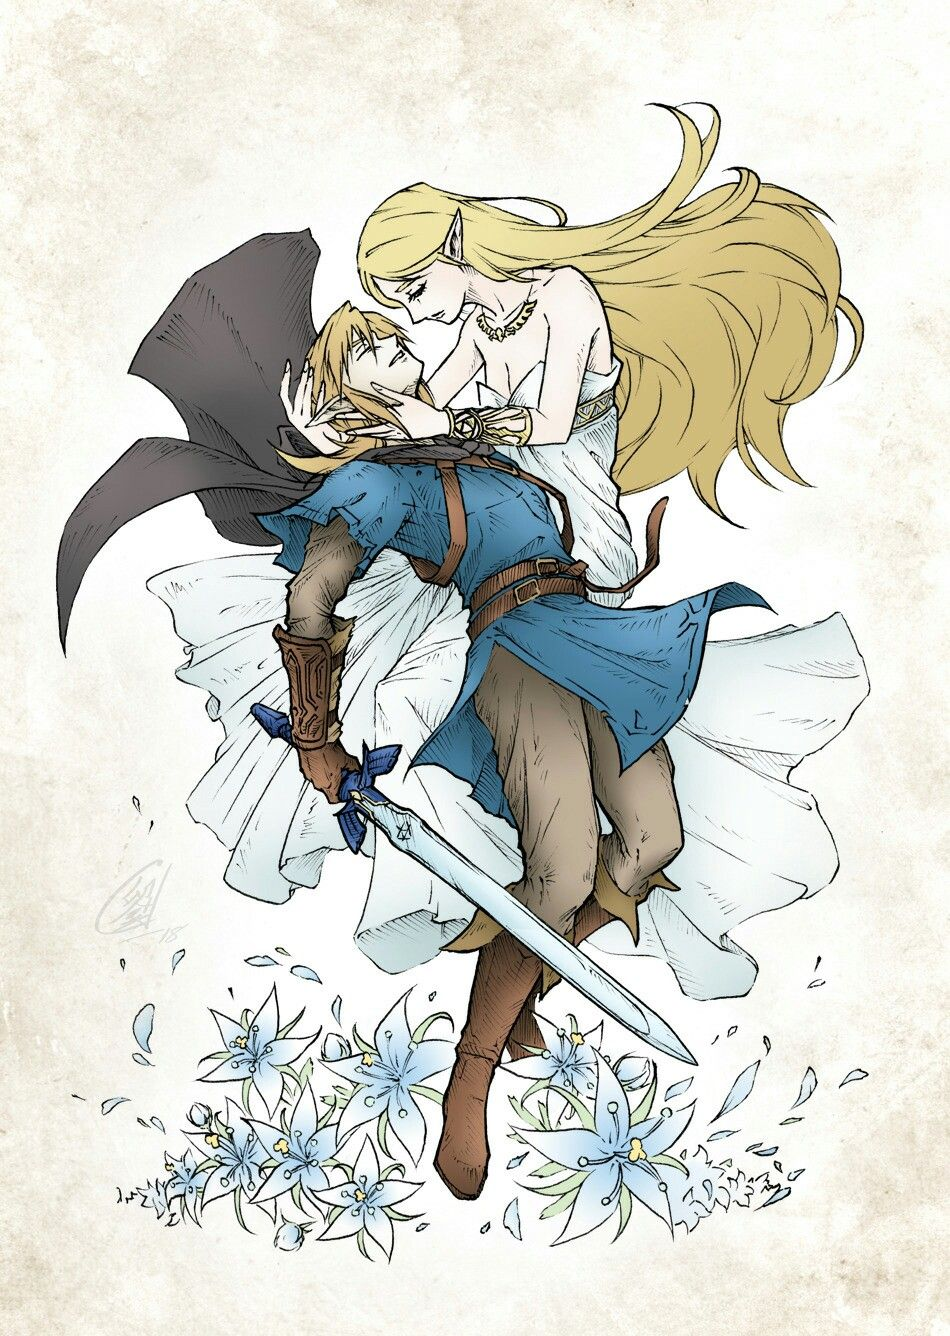 Don T Give Up Link You Re Our Last Chance Dessin Zelda Dessin